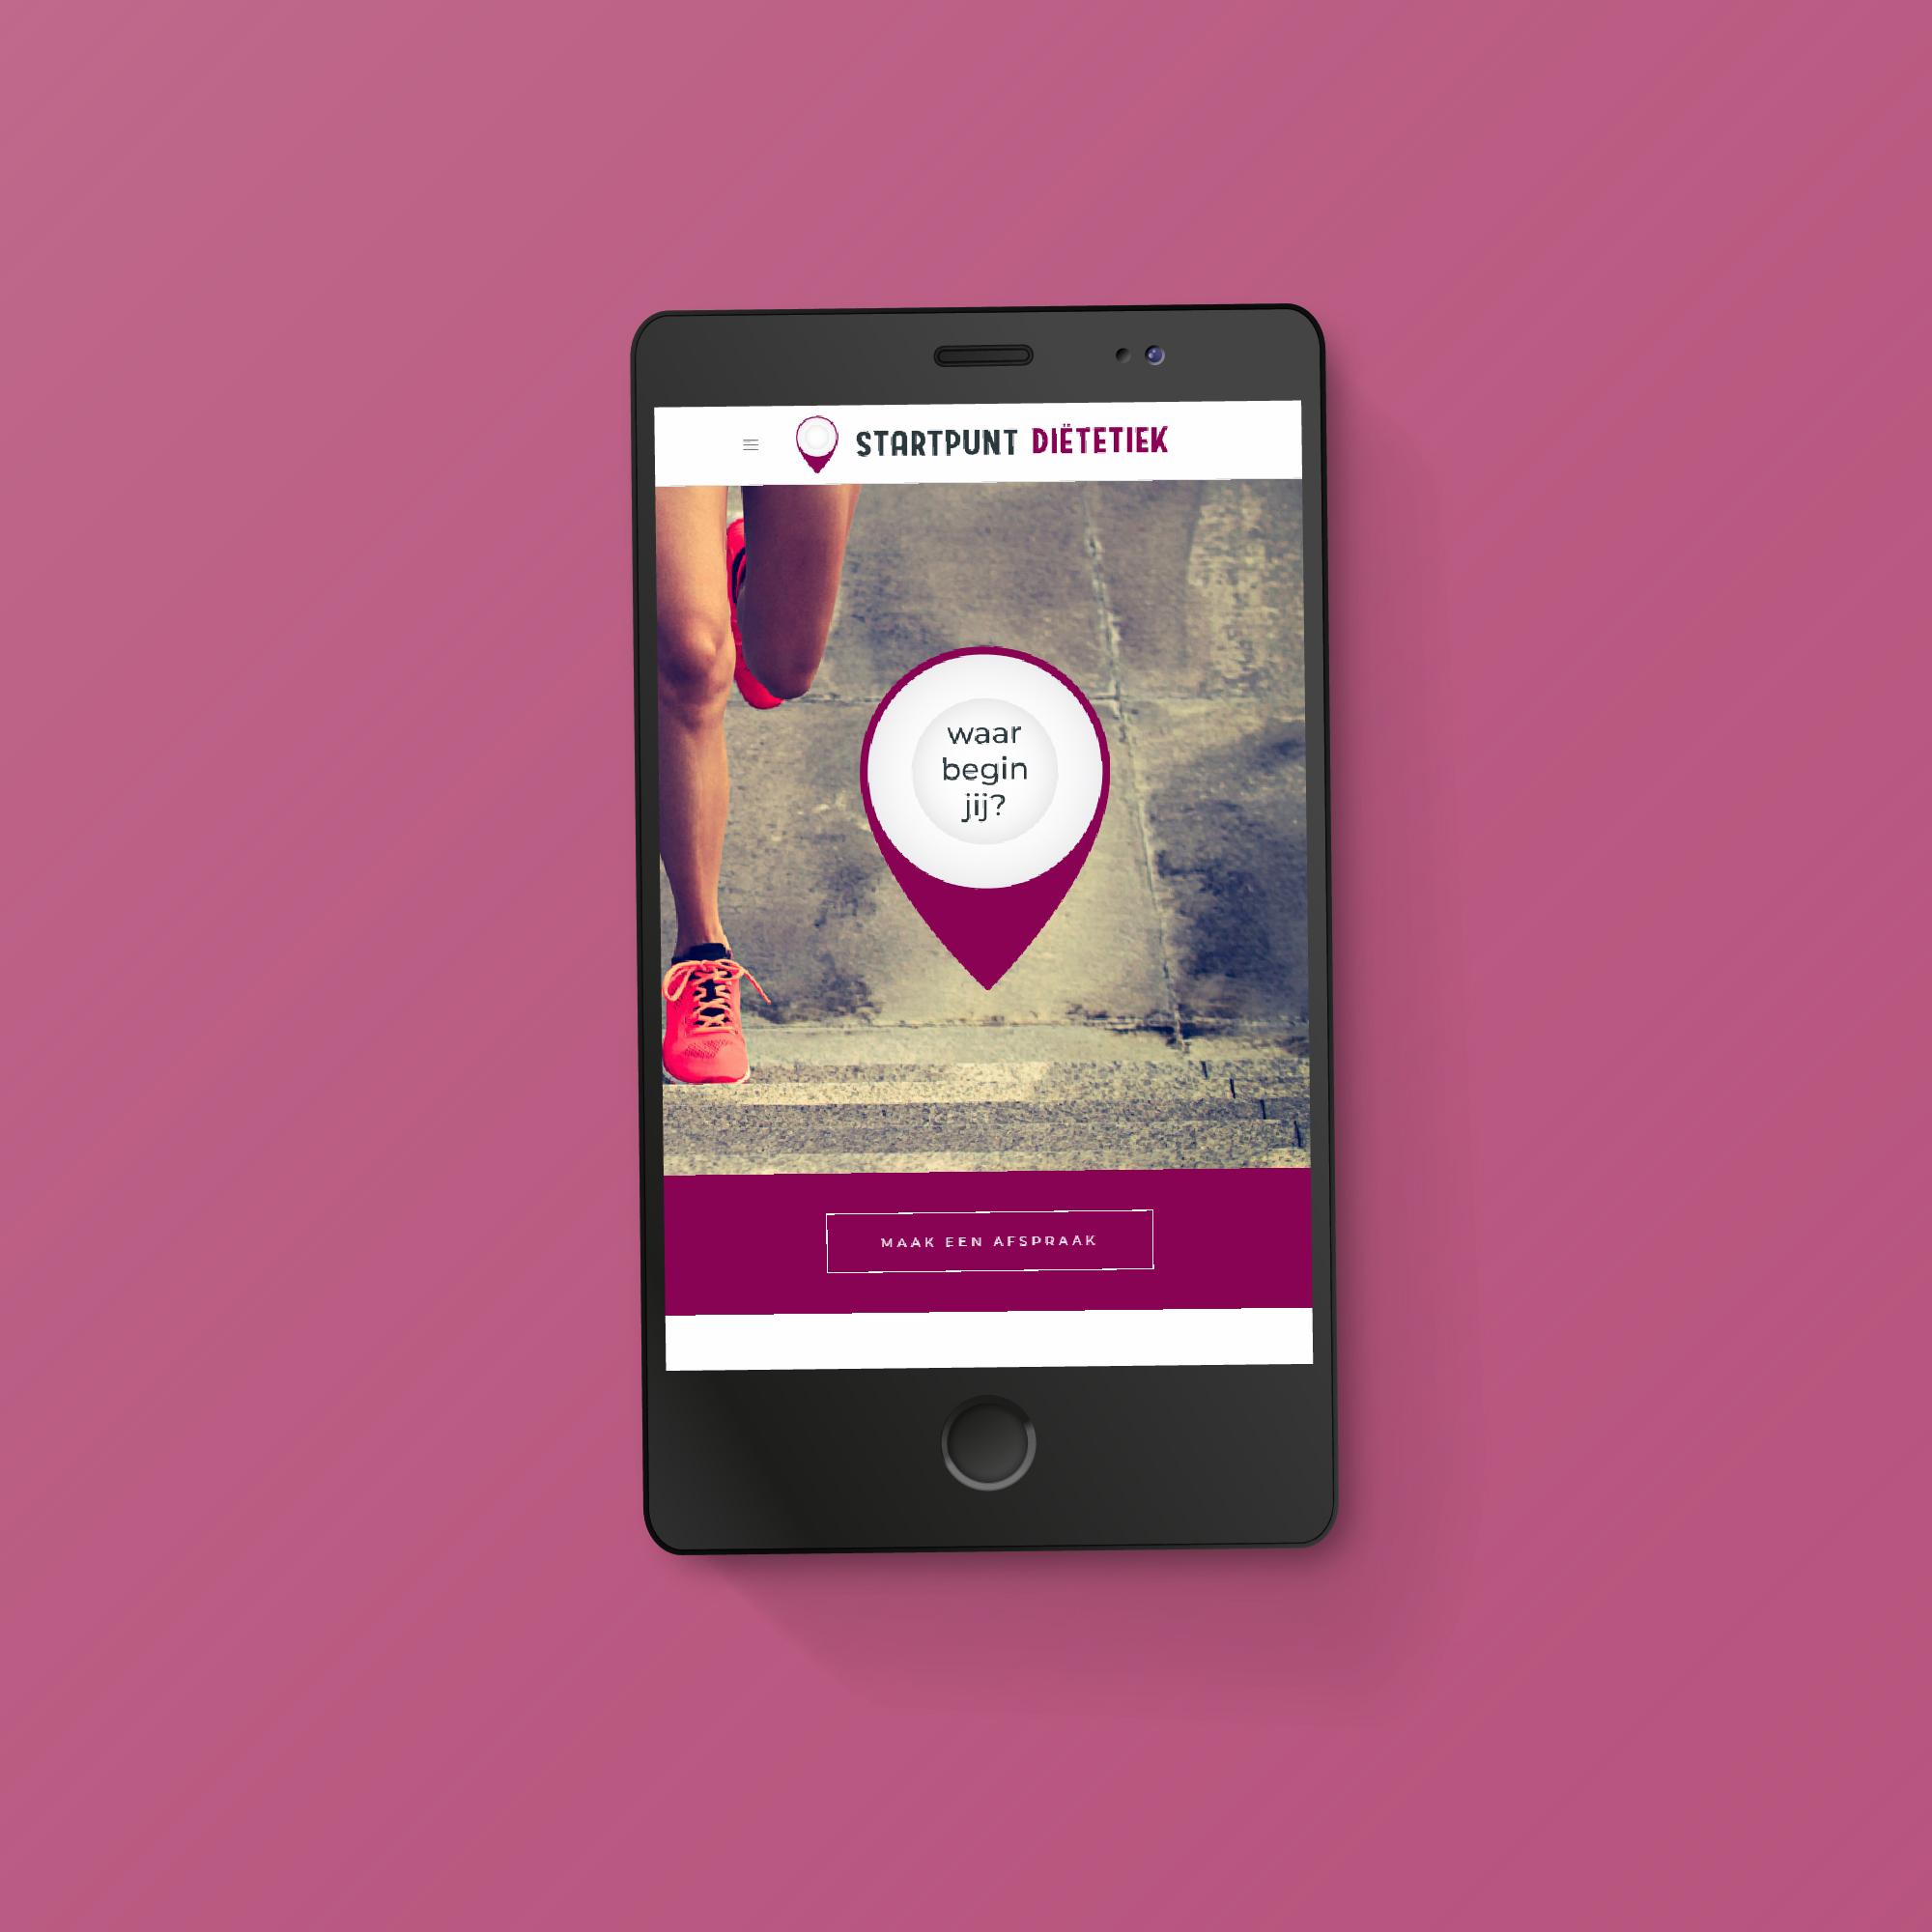 portfolio-dimgray-startpunt-dietetiek-website-3